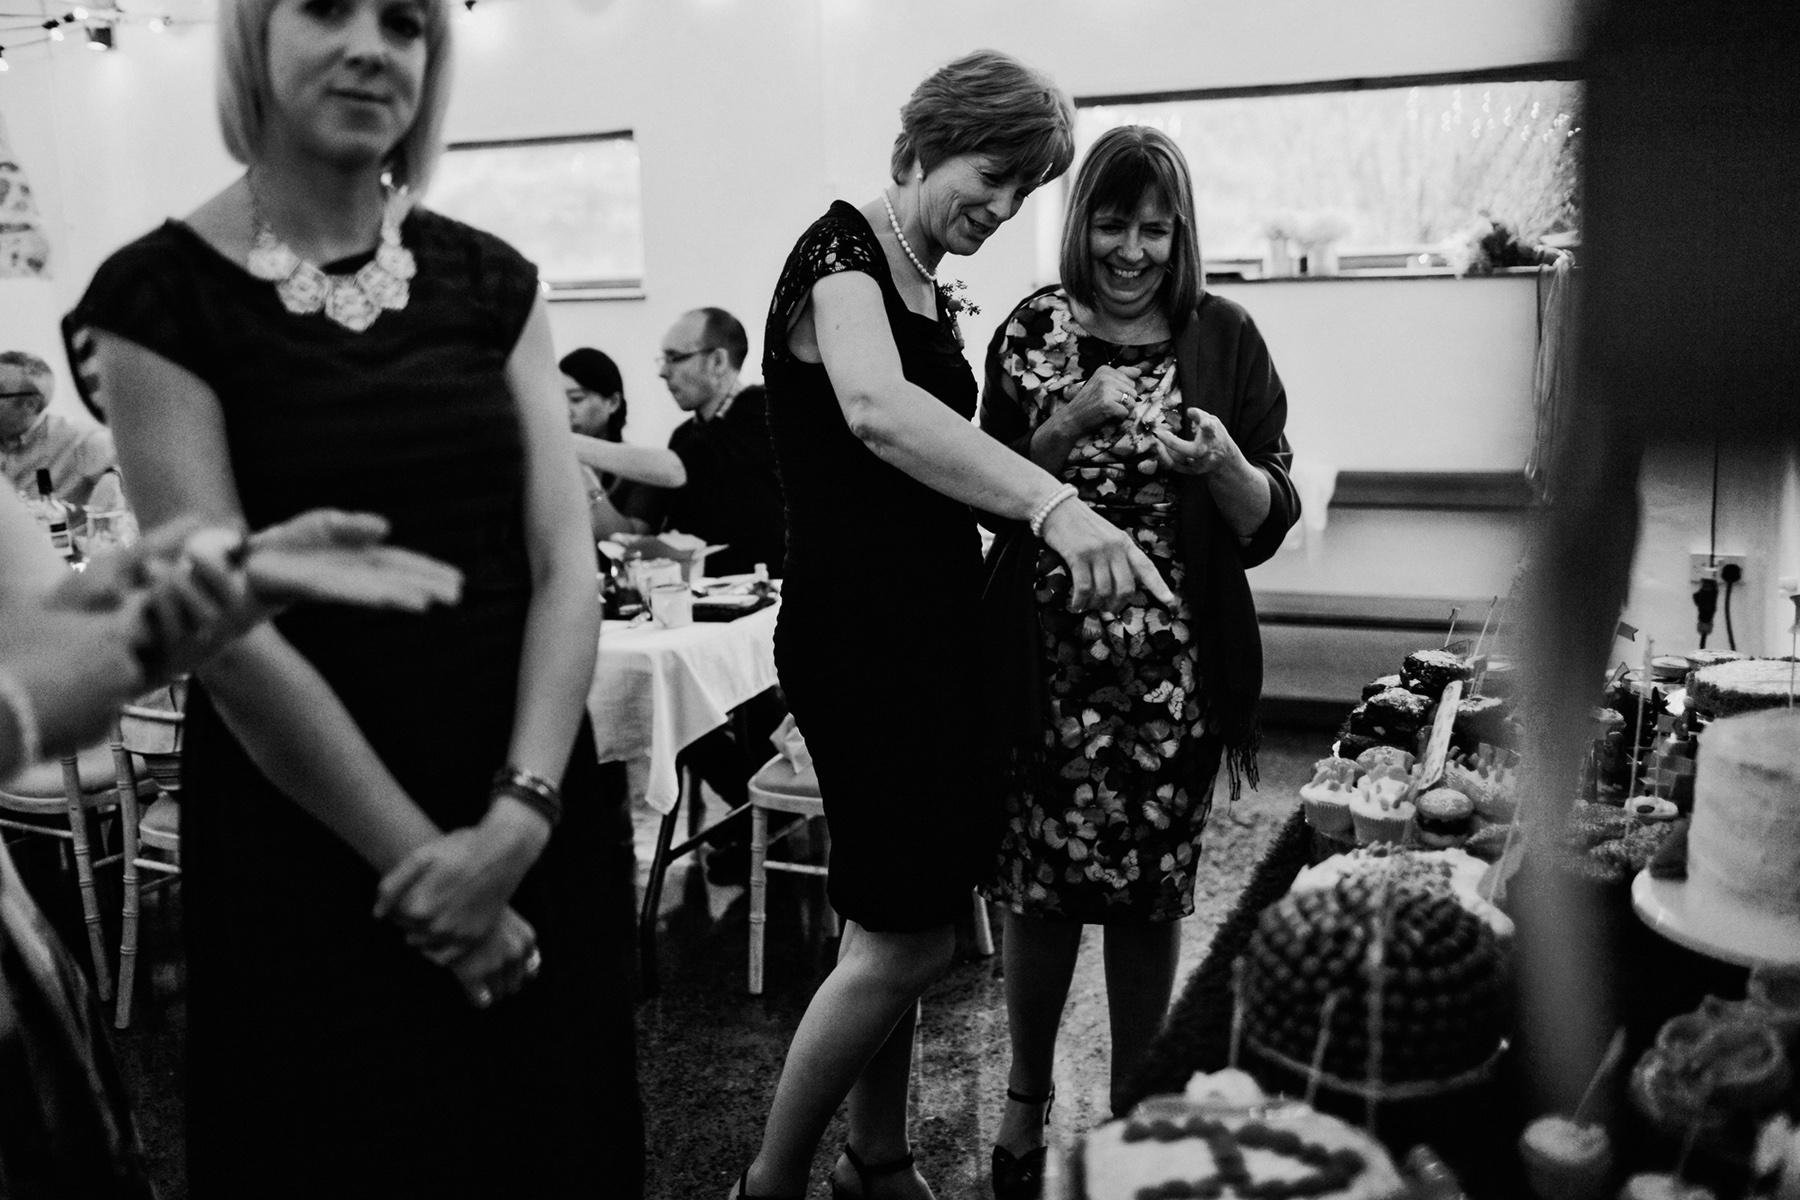 Snowdonia-Wales-Wedding-Photos-0393.jpg